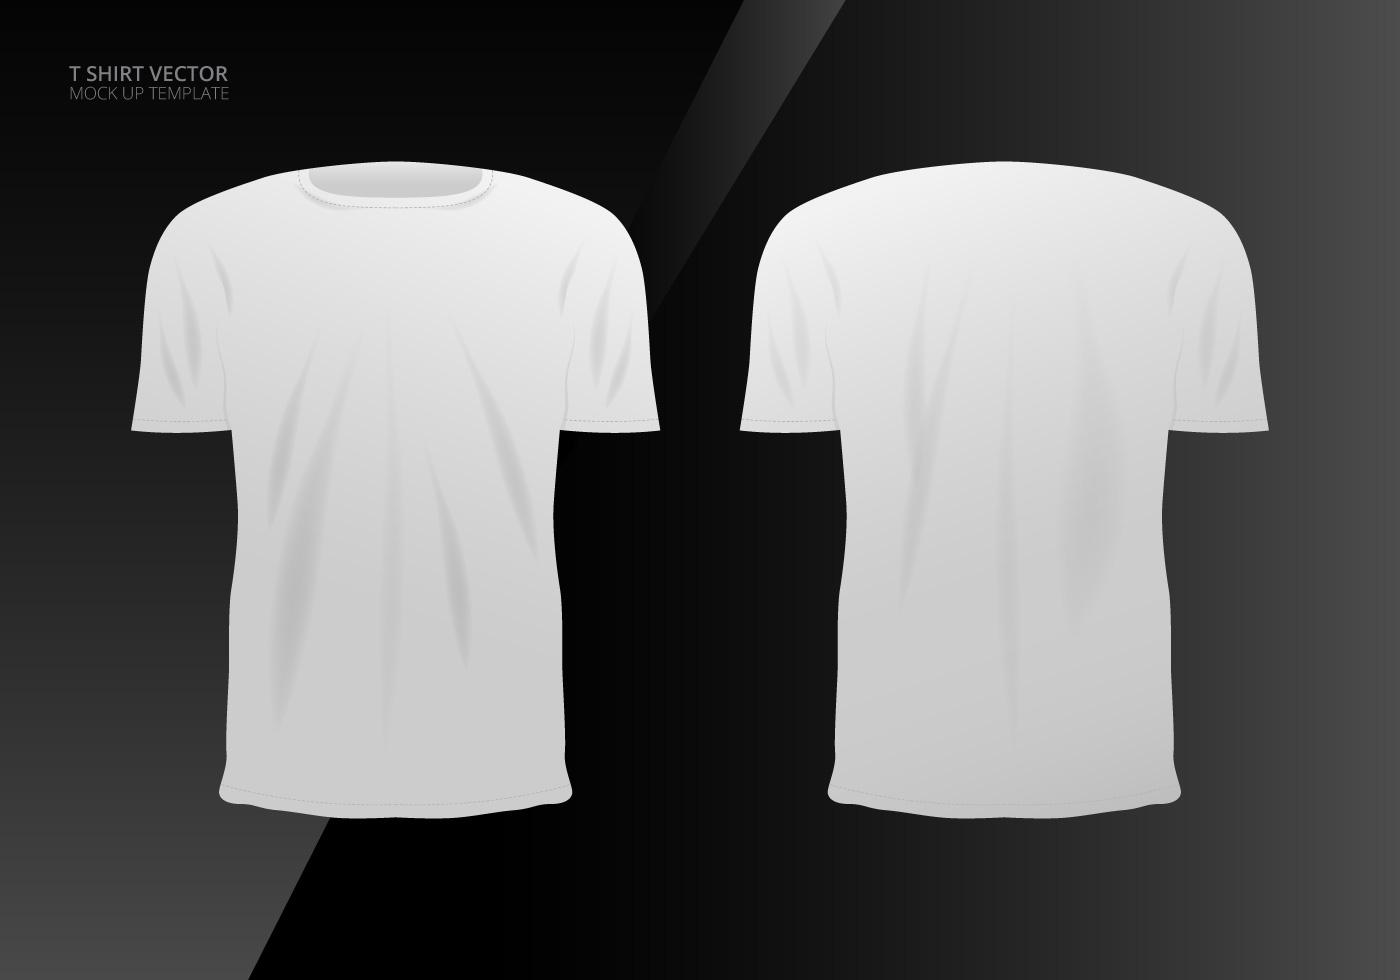 T Shirt Mock Up Free Vector Art - (3627 Free Downloads)